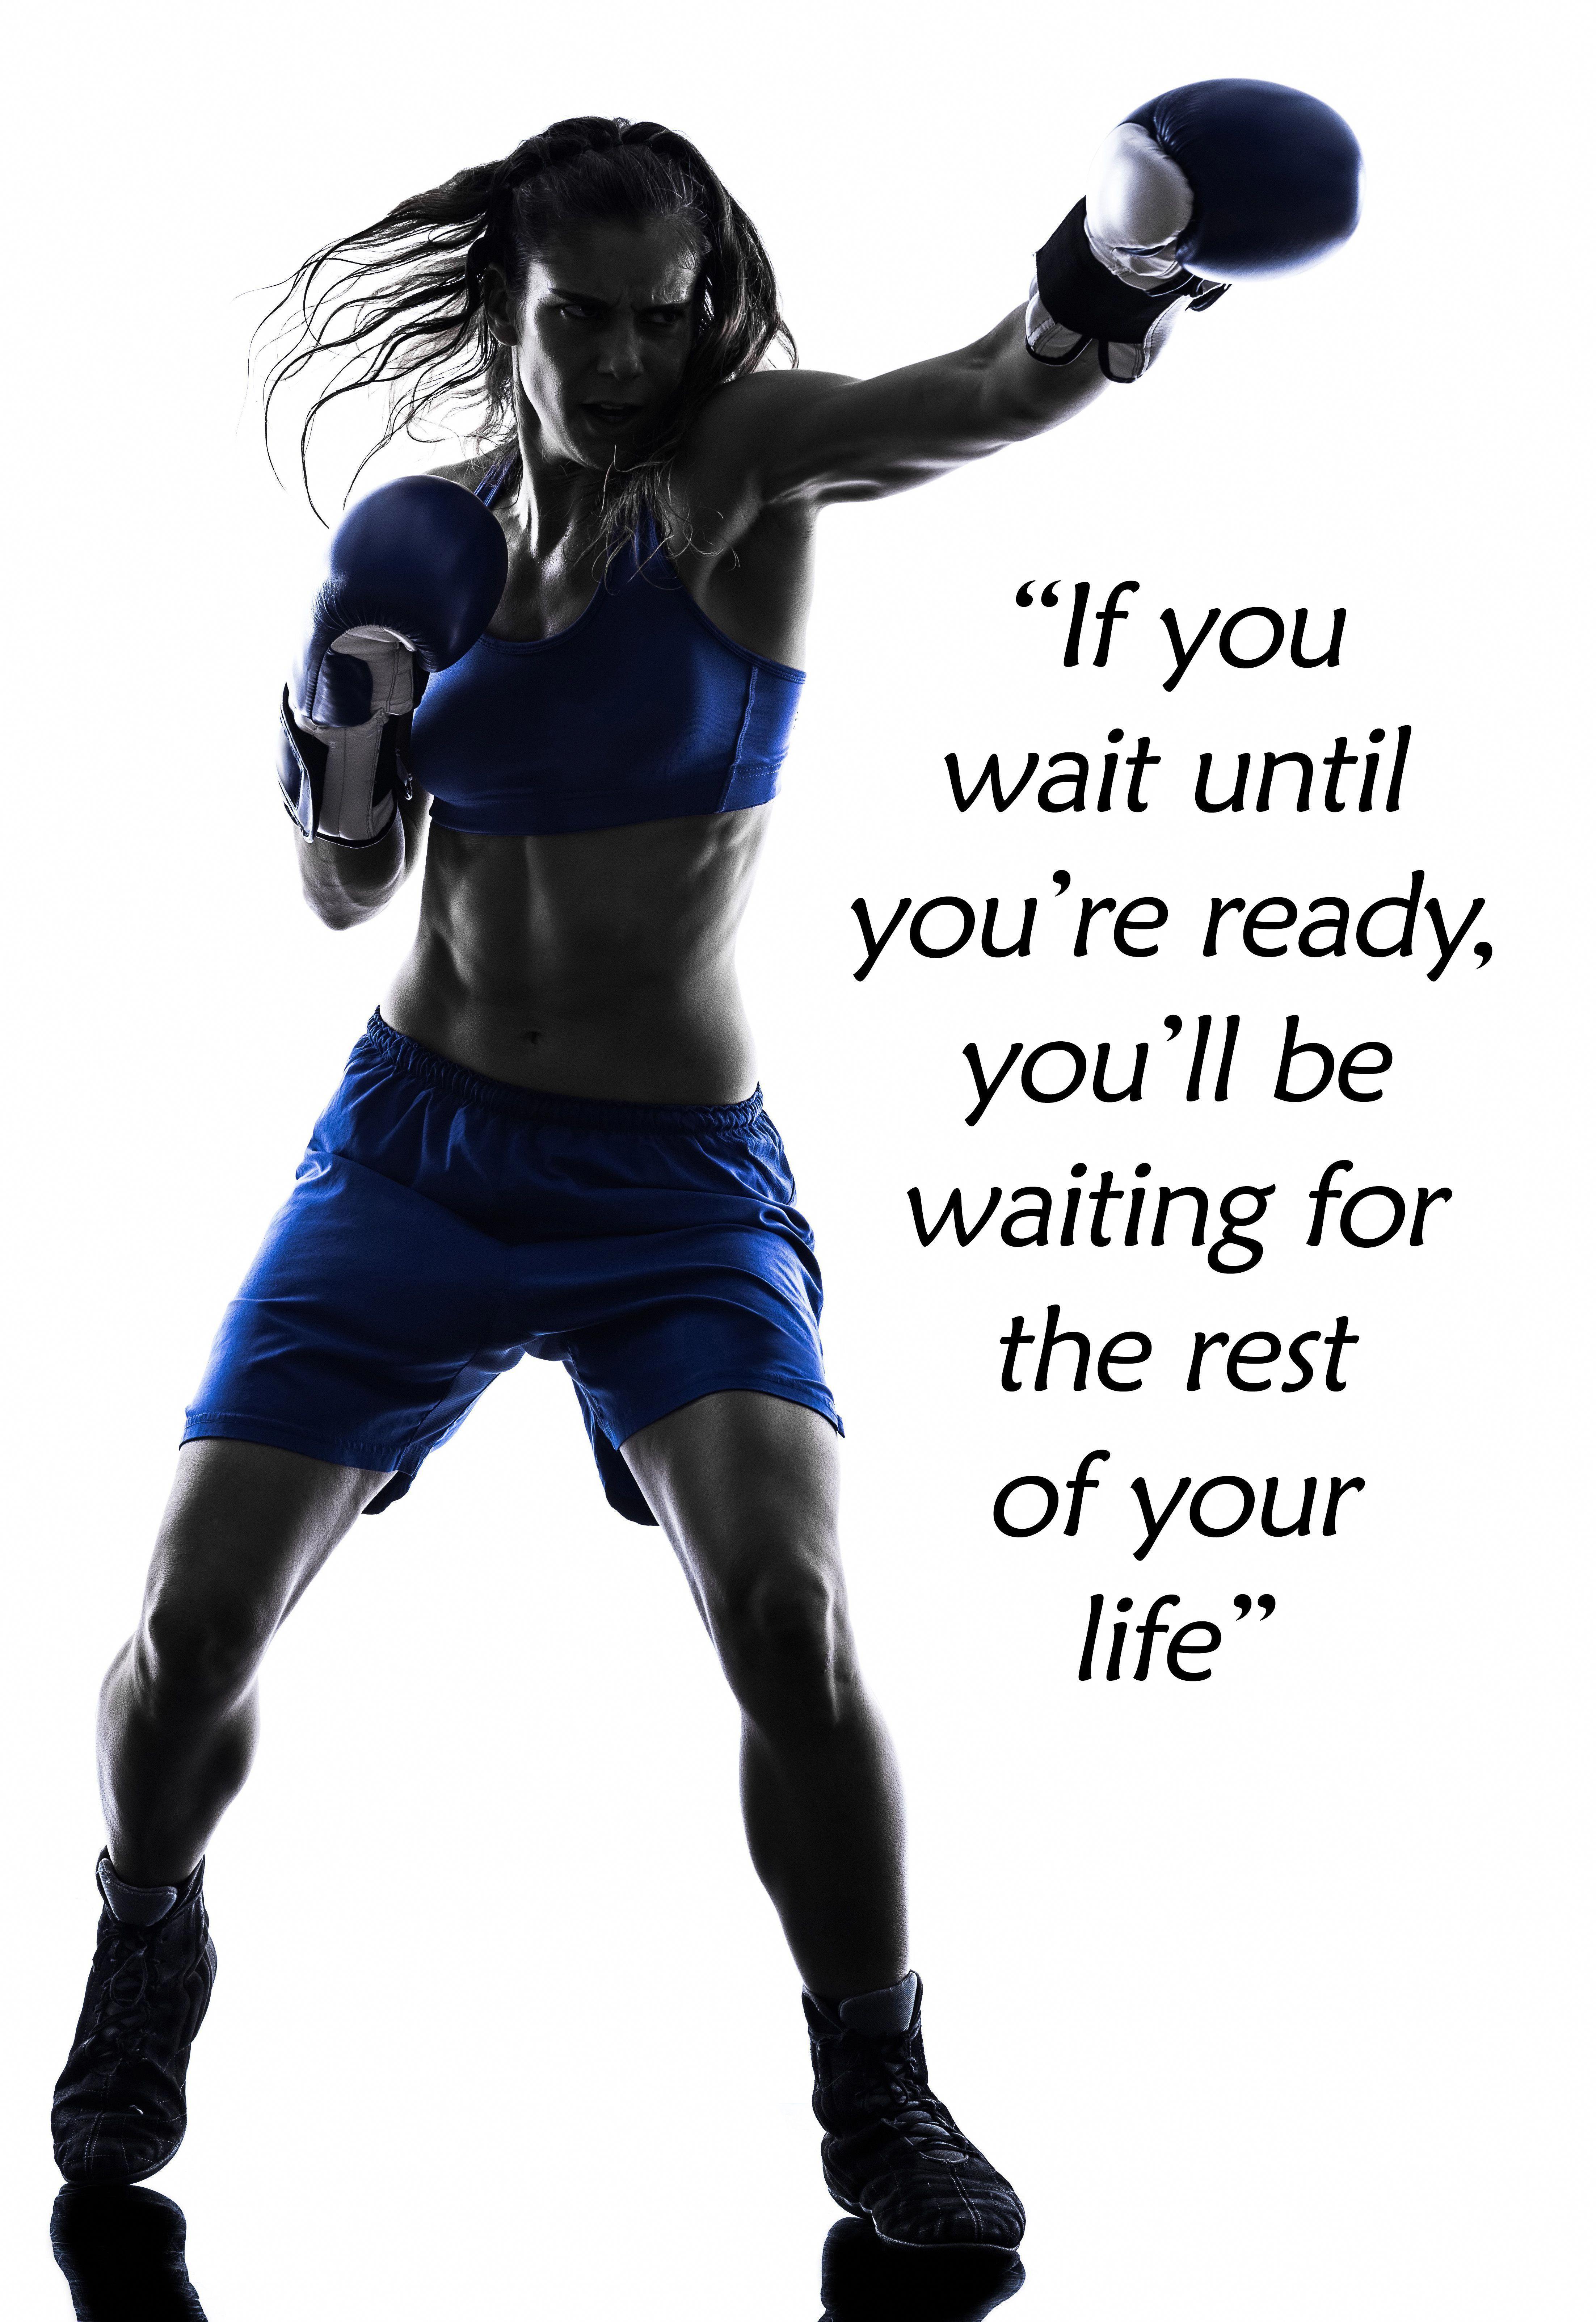 Kickboxing Pad Workouts Martial Arts Self Defense Skills Training Personal Fitness Training More At Ww Martial Arts Workout Martial Arts Fitness Training